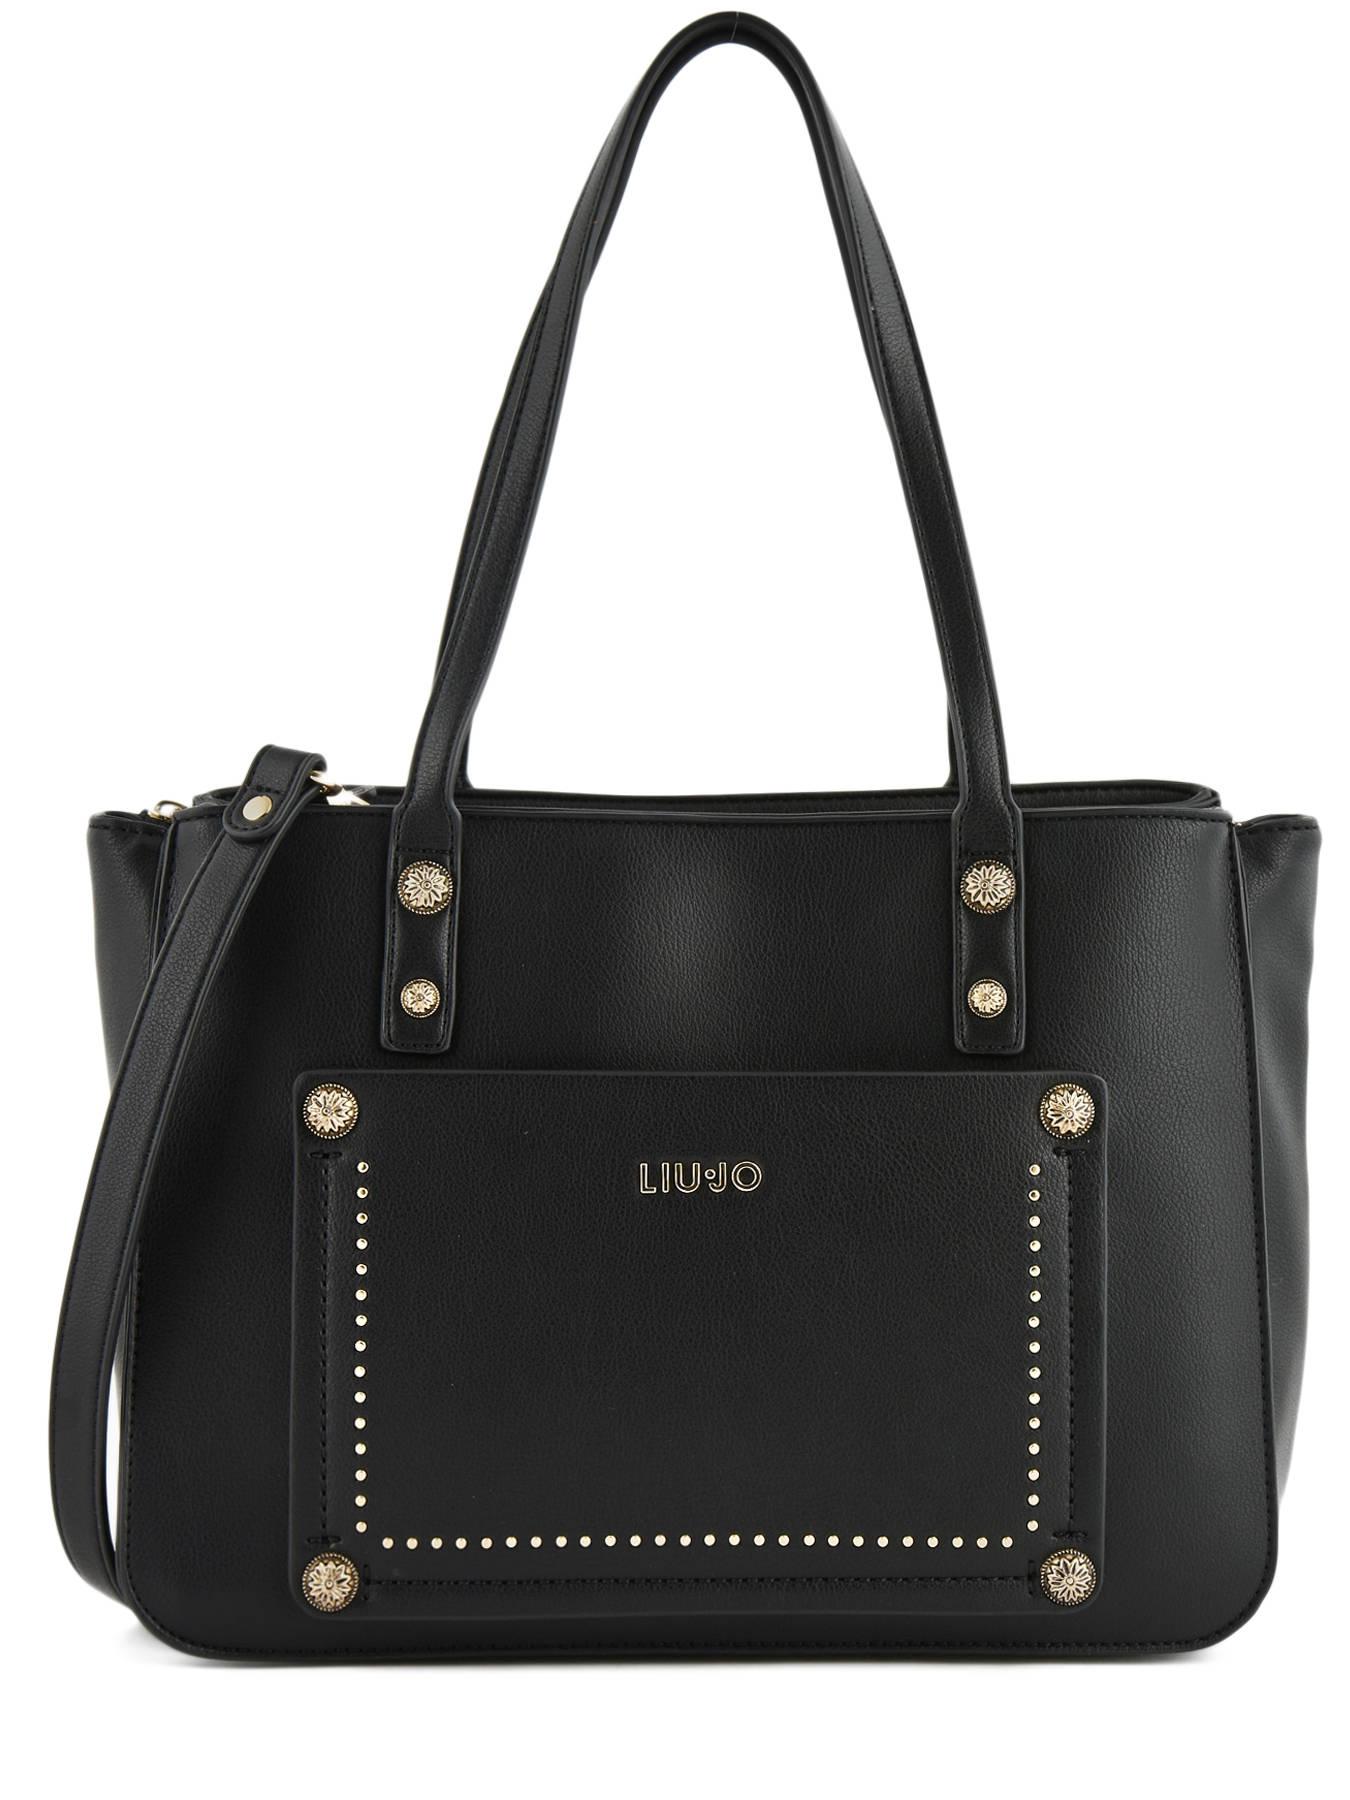 ... Shopper Aniene Liu jo Black aniene A19058 ... e642141b32f